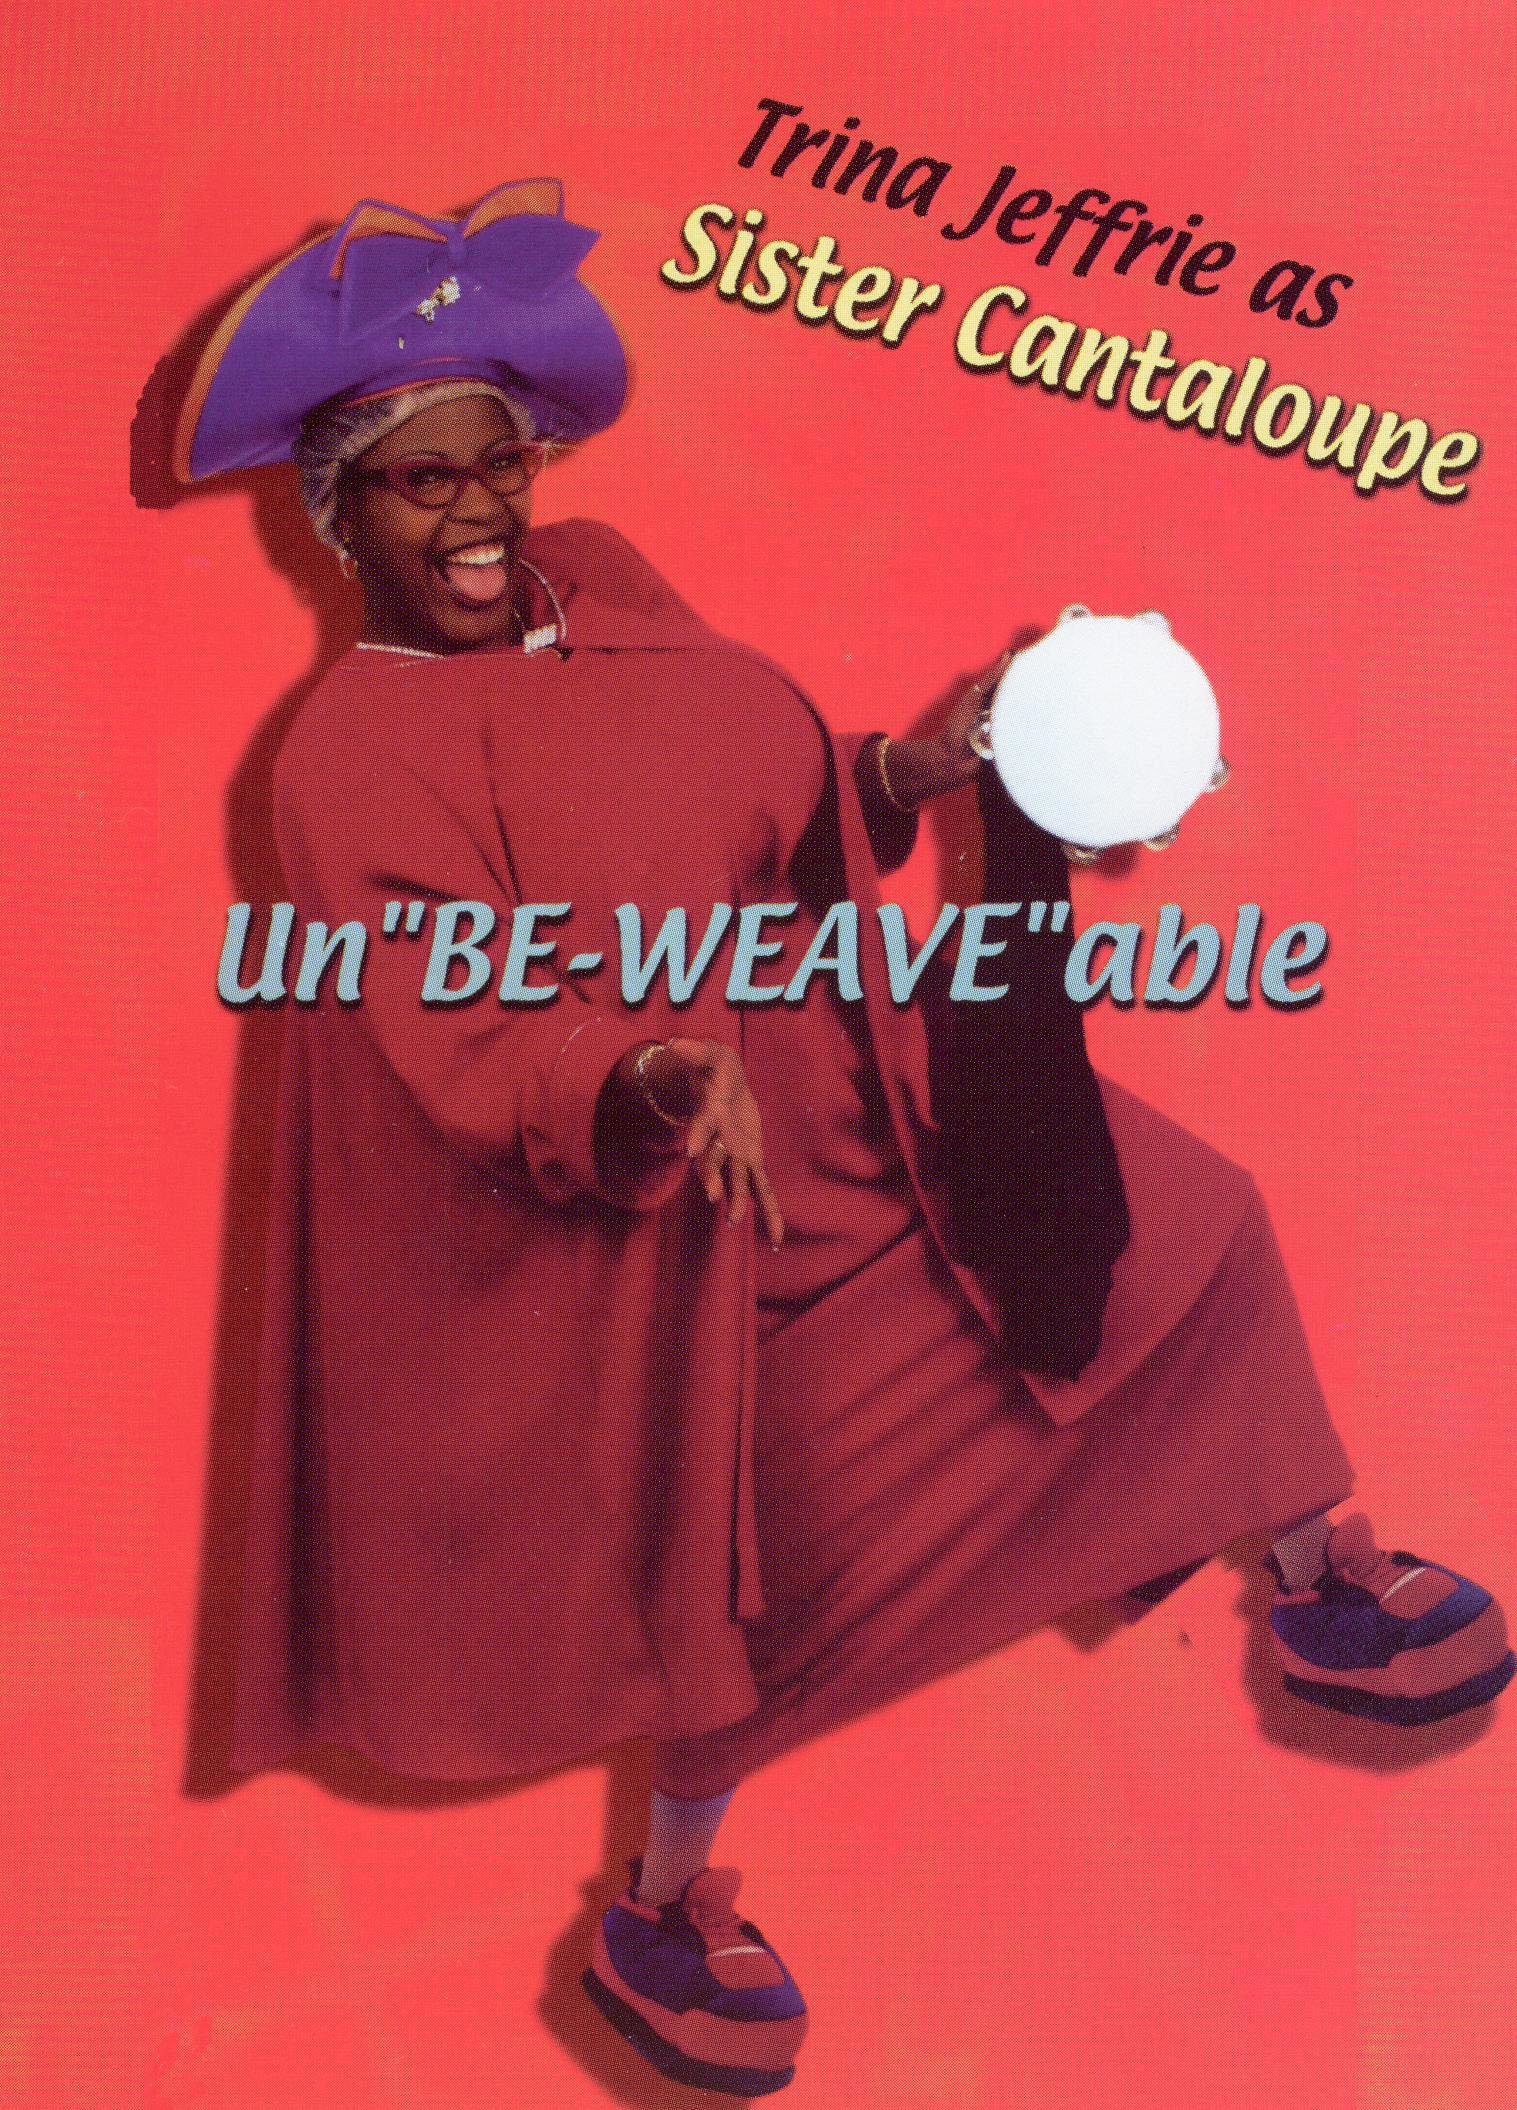 Sister Cantaloupe: Unbe-Weave-Able